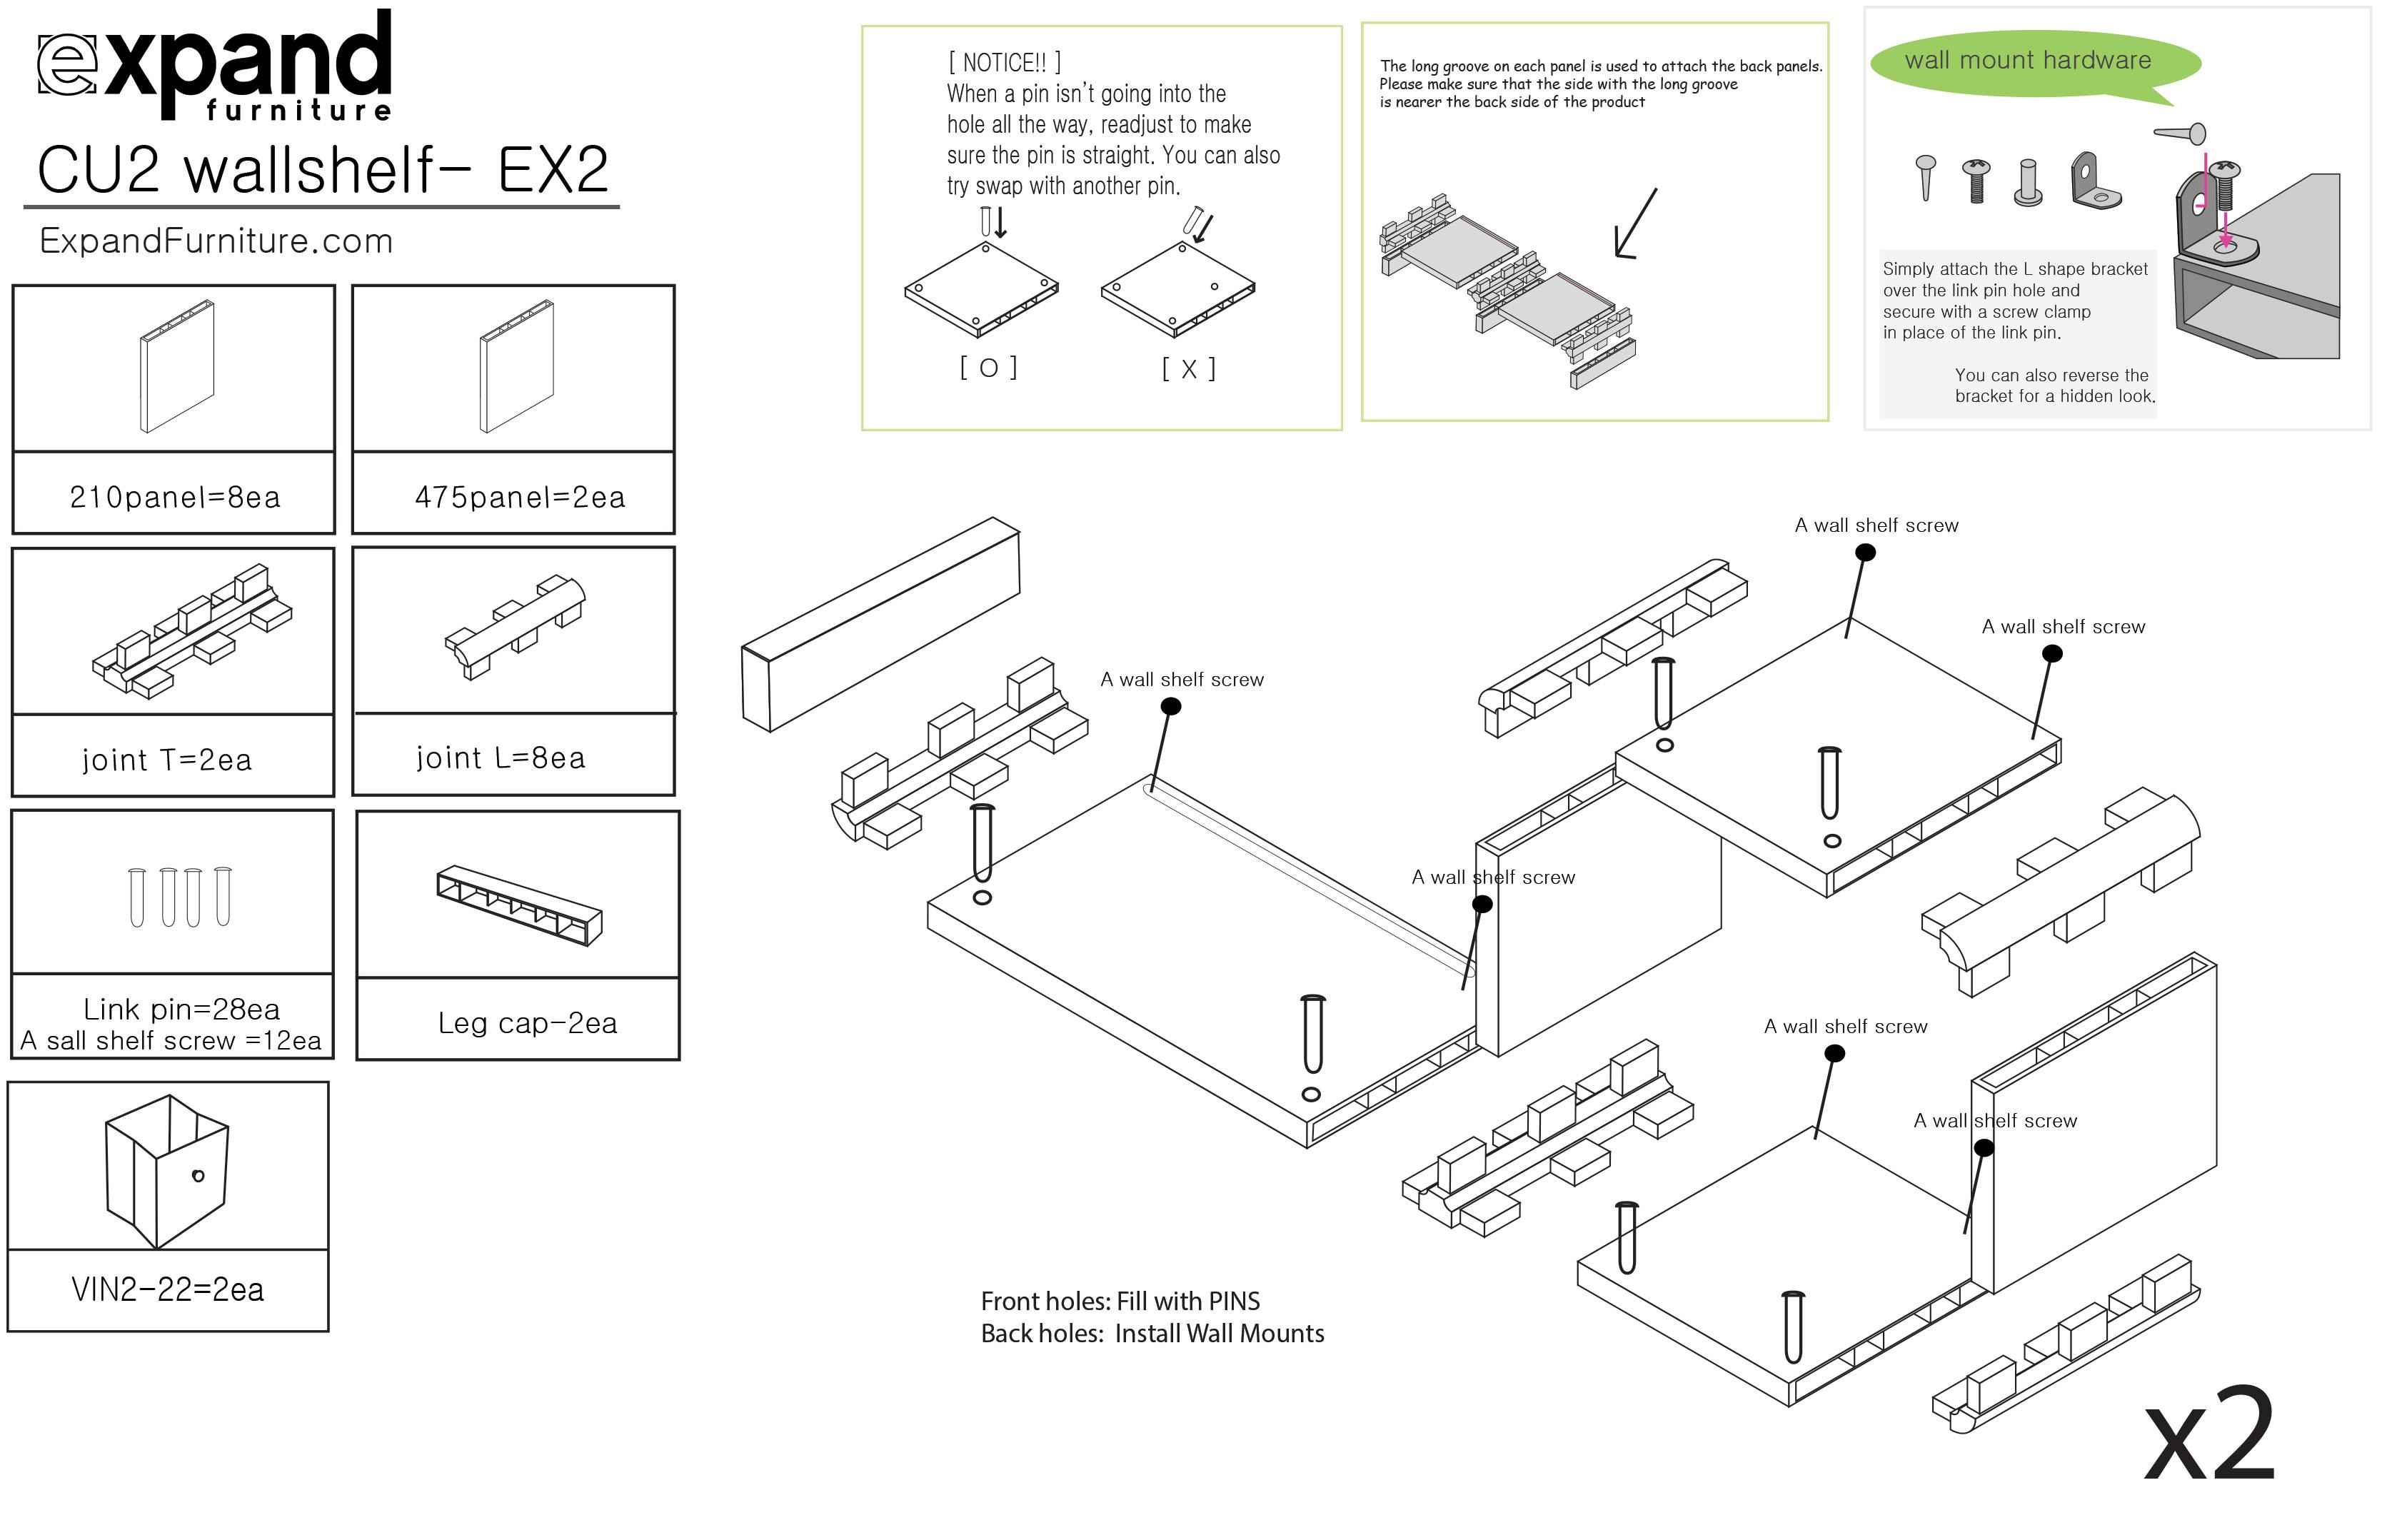 Ex2 decorative shelf with storage expand wall shelf ex2 diagram prev ccuart Image collections